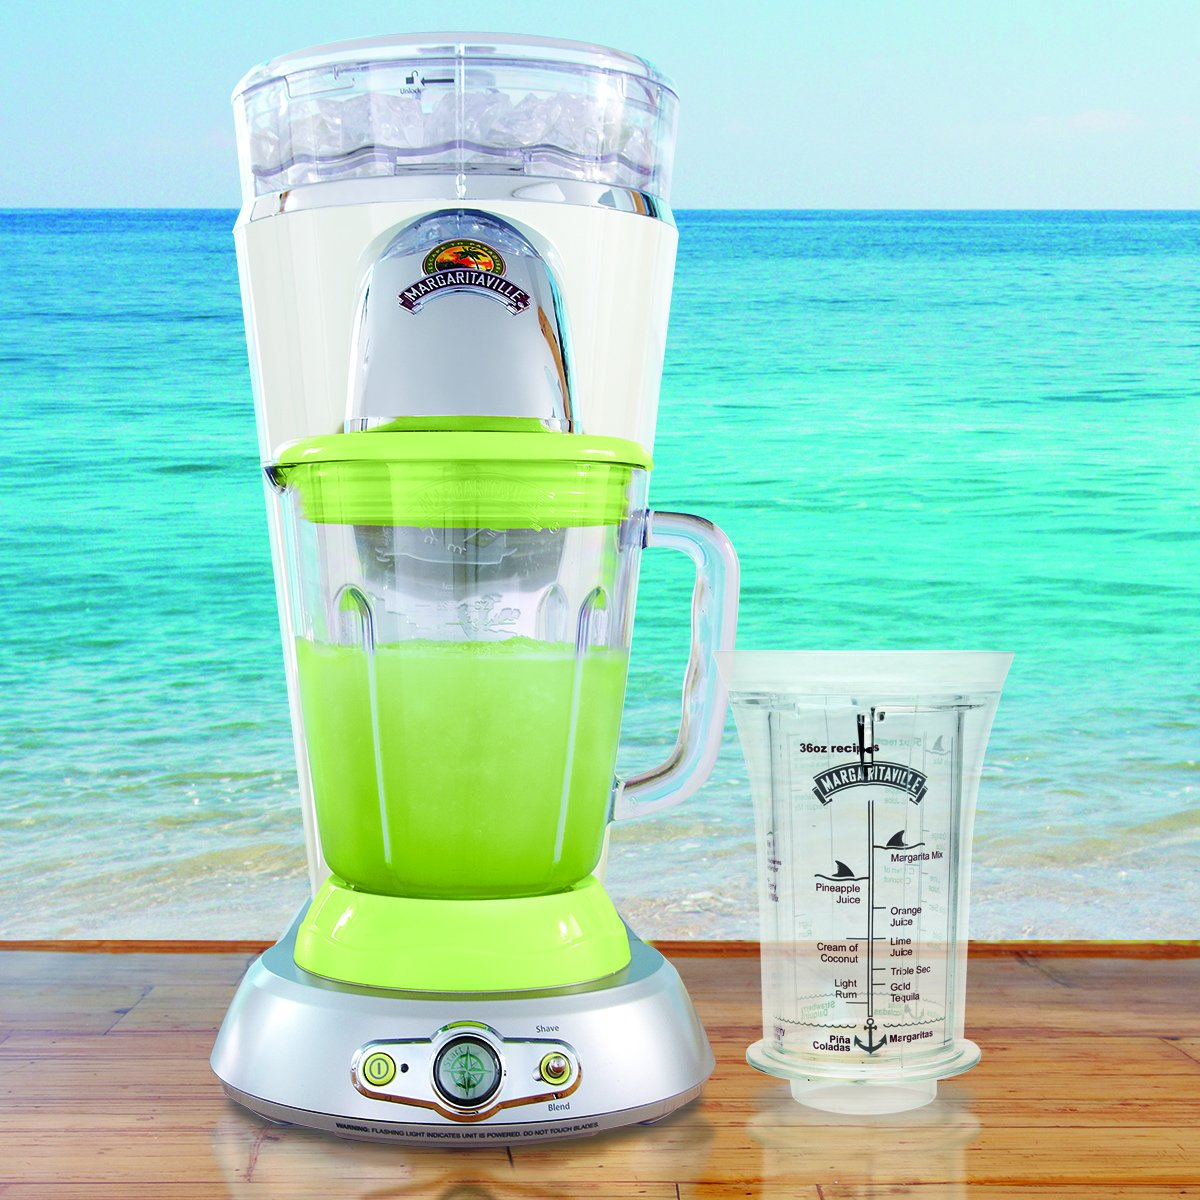 Margaritaville Bahamas Frozen Concoction Maker & No-Brainer Mixer by Margaritaville